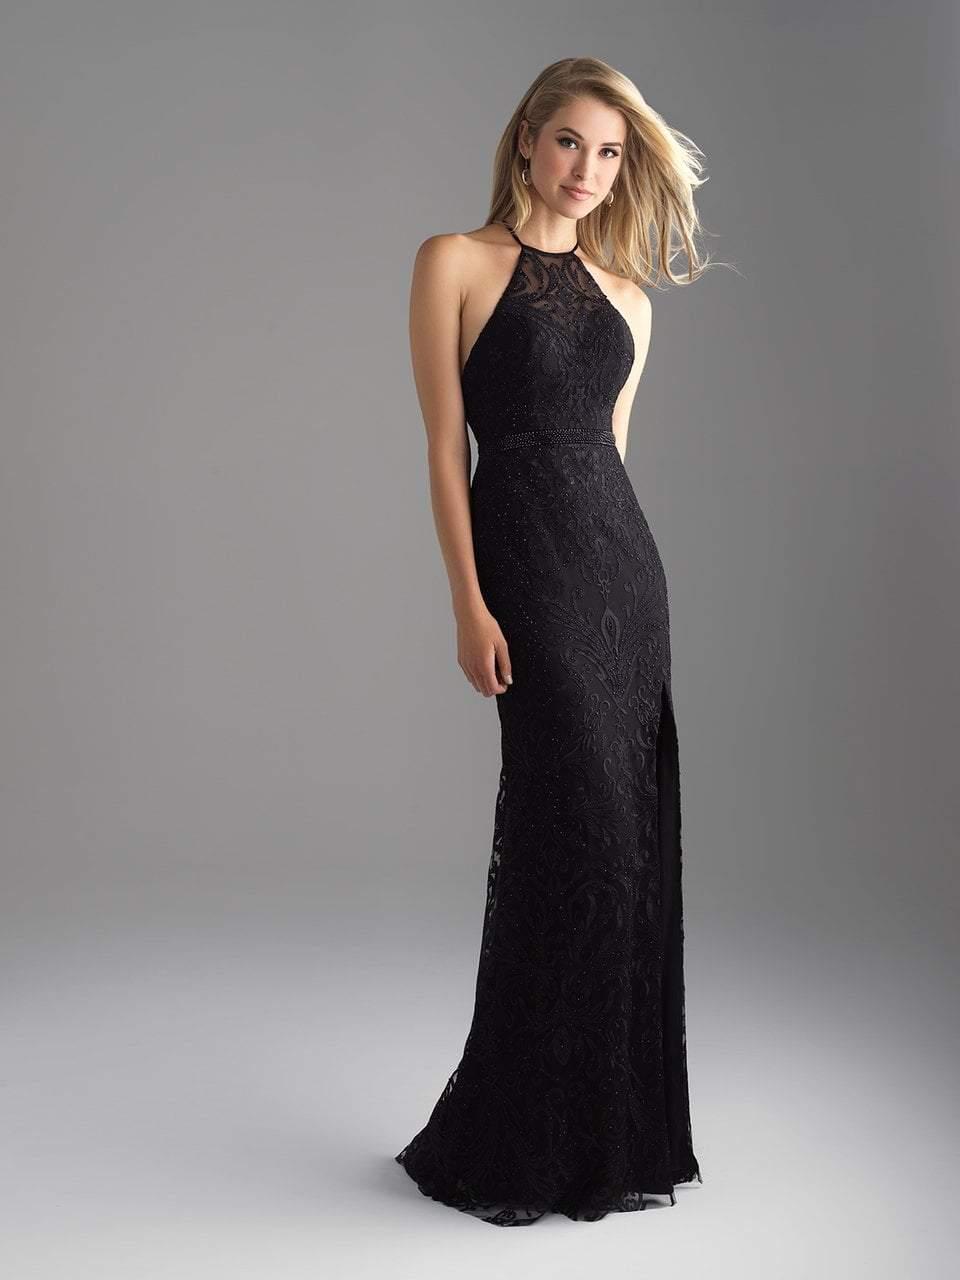 Madison James - 18-687 Embroidered Halter Sheath Dress